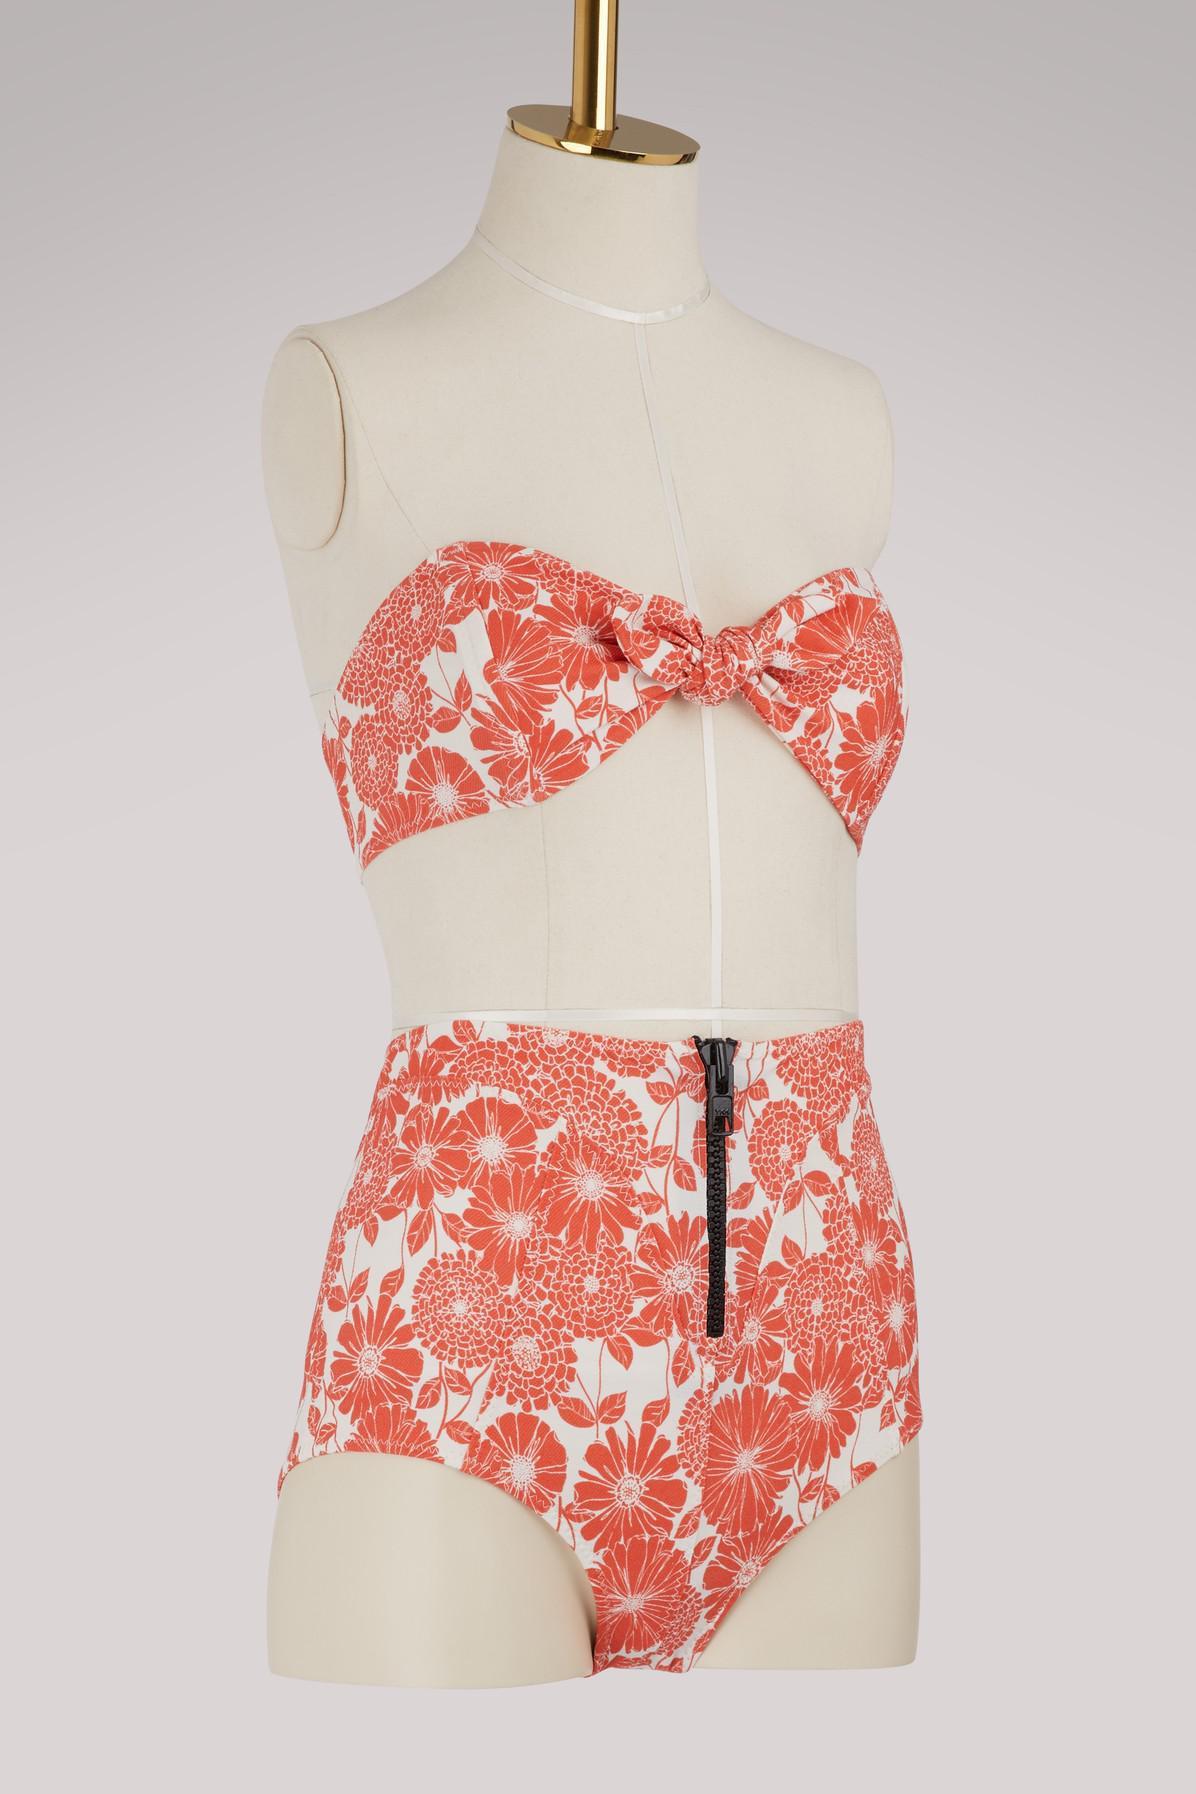 fde727be9ebb3 Lisa Marie Fernandez - Red Poppy High Waist Bikini - Lyst. View fullscreen